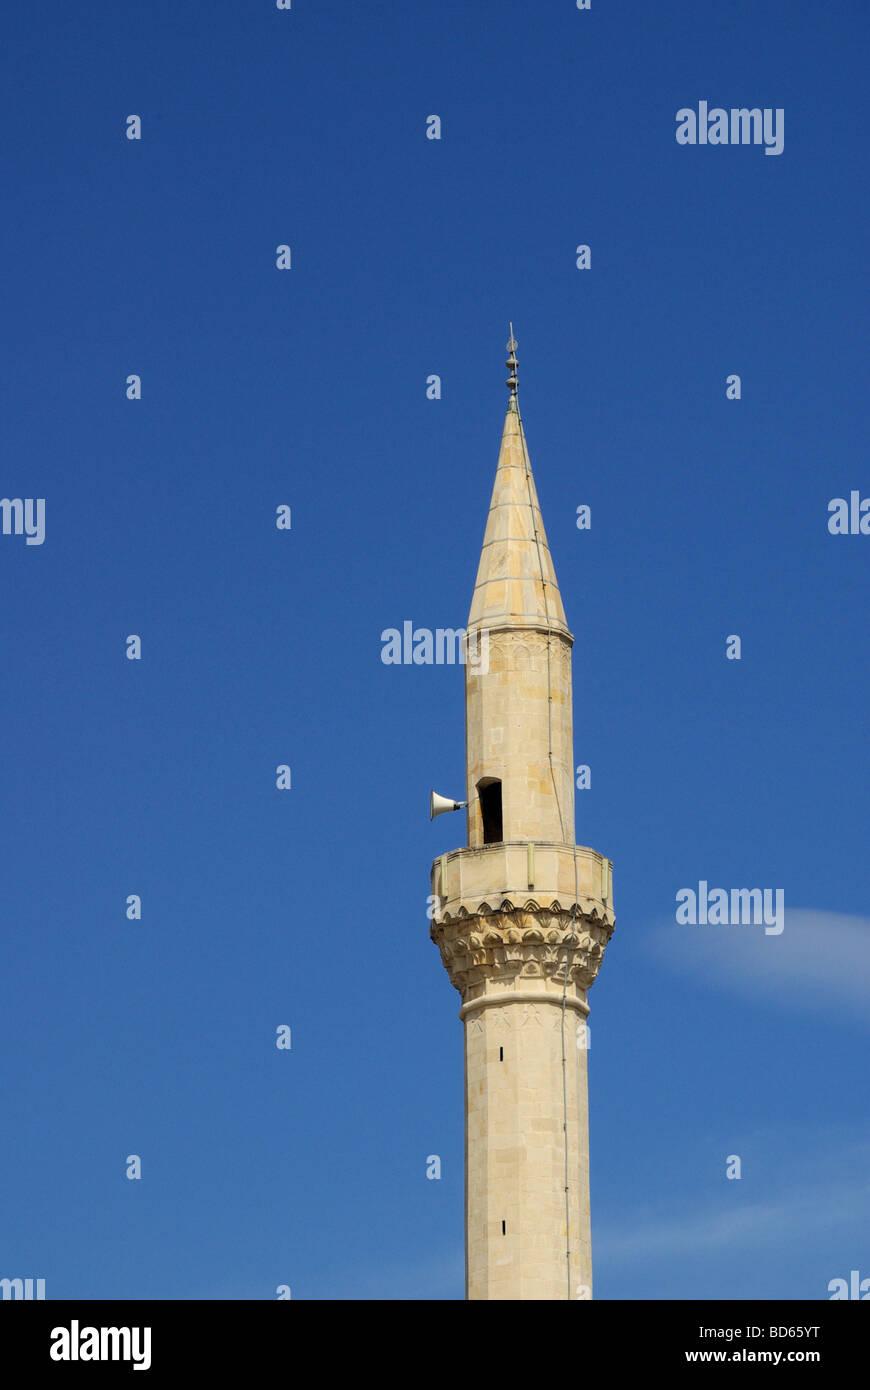 Mostar Moschee Mostar mosque 06 - Stock Image